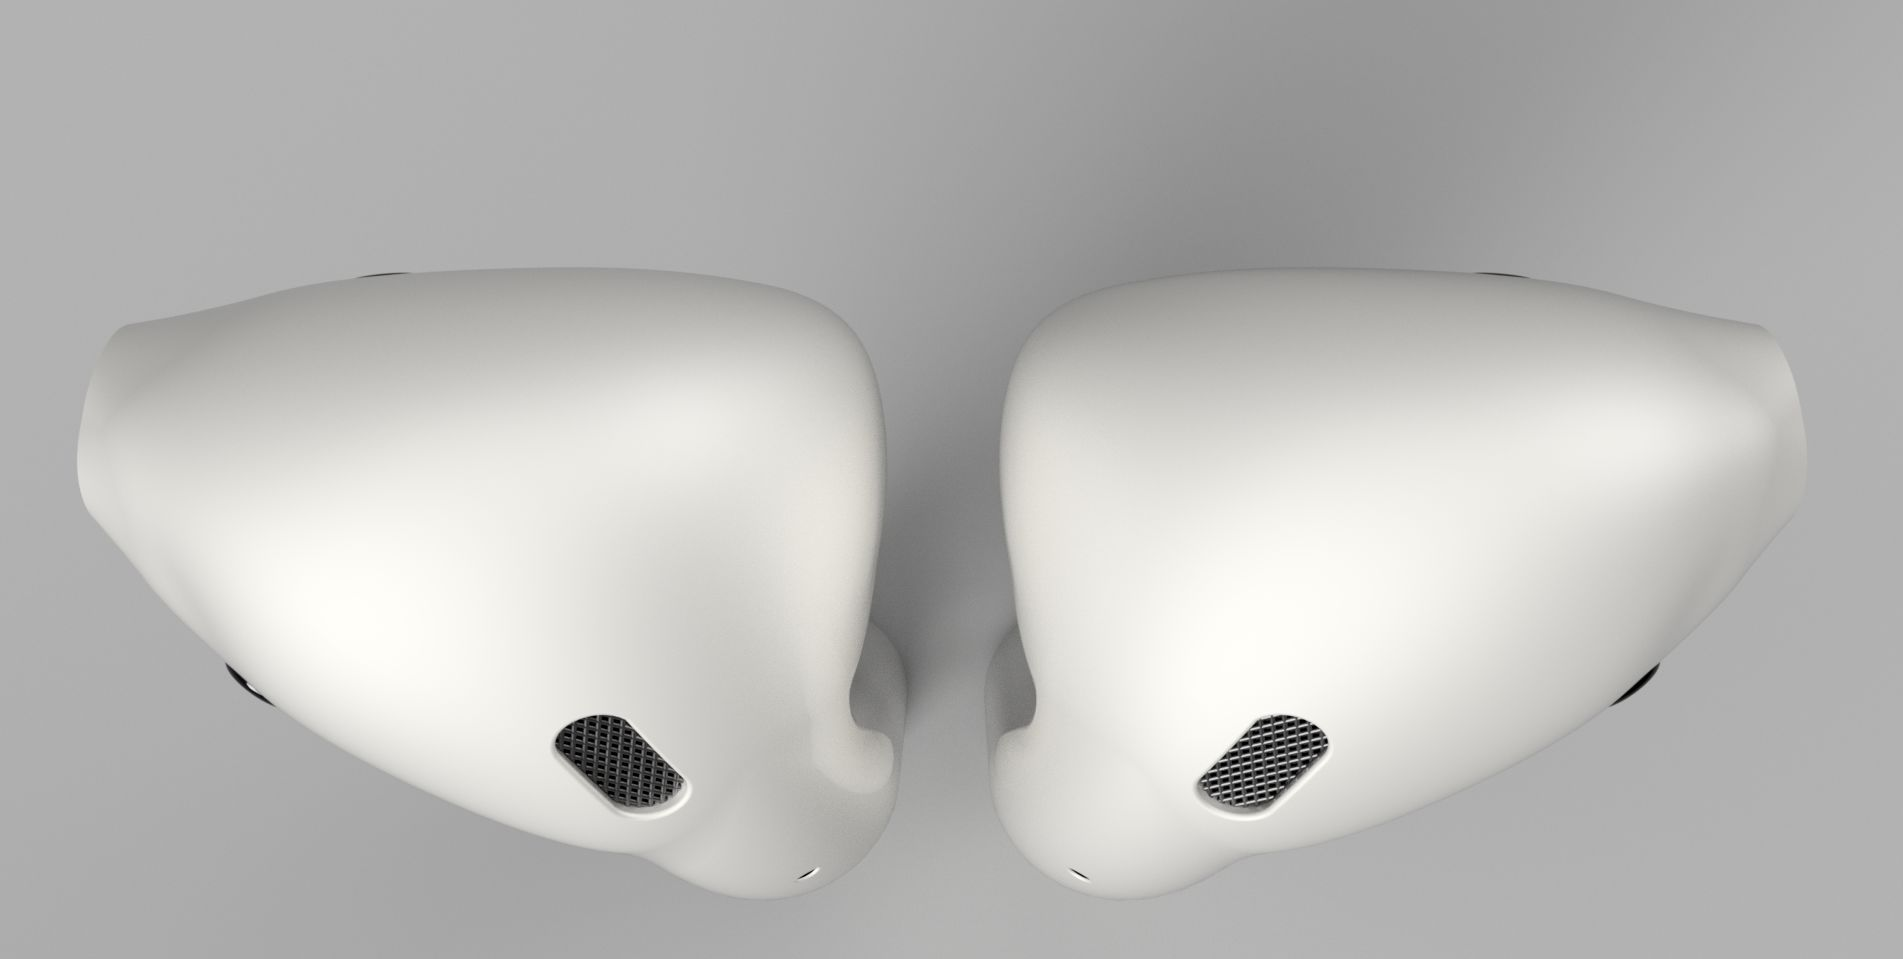 Airpods-v68-3500-3500